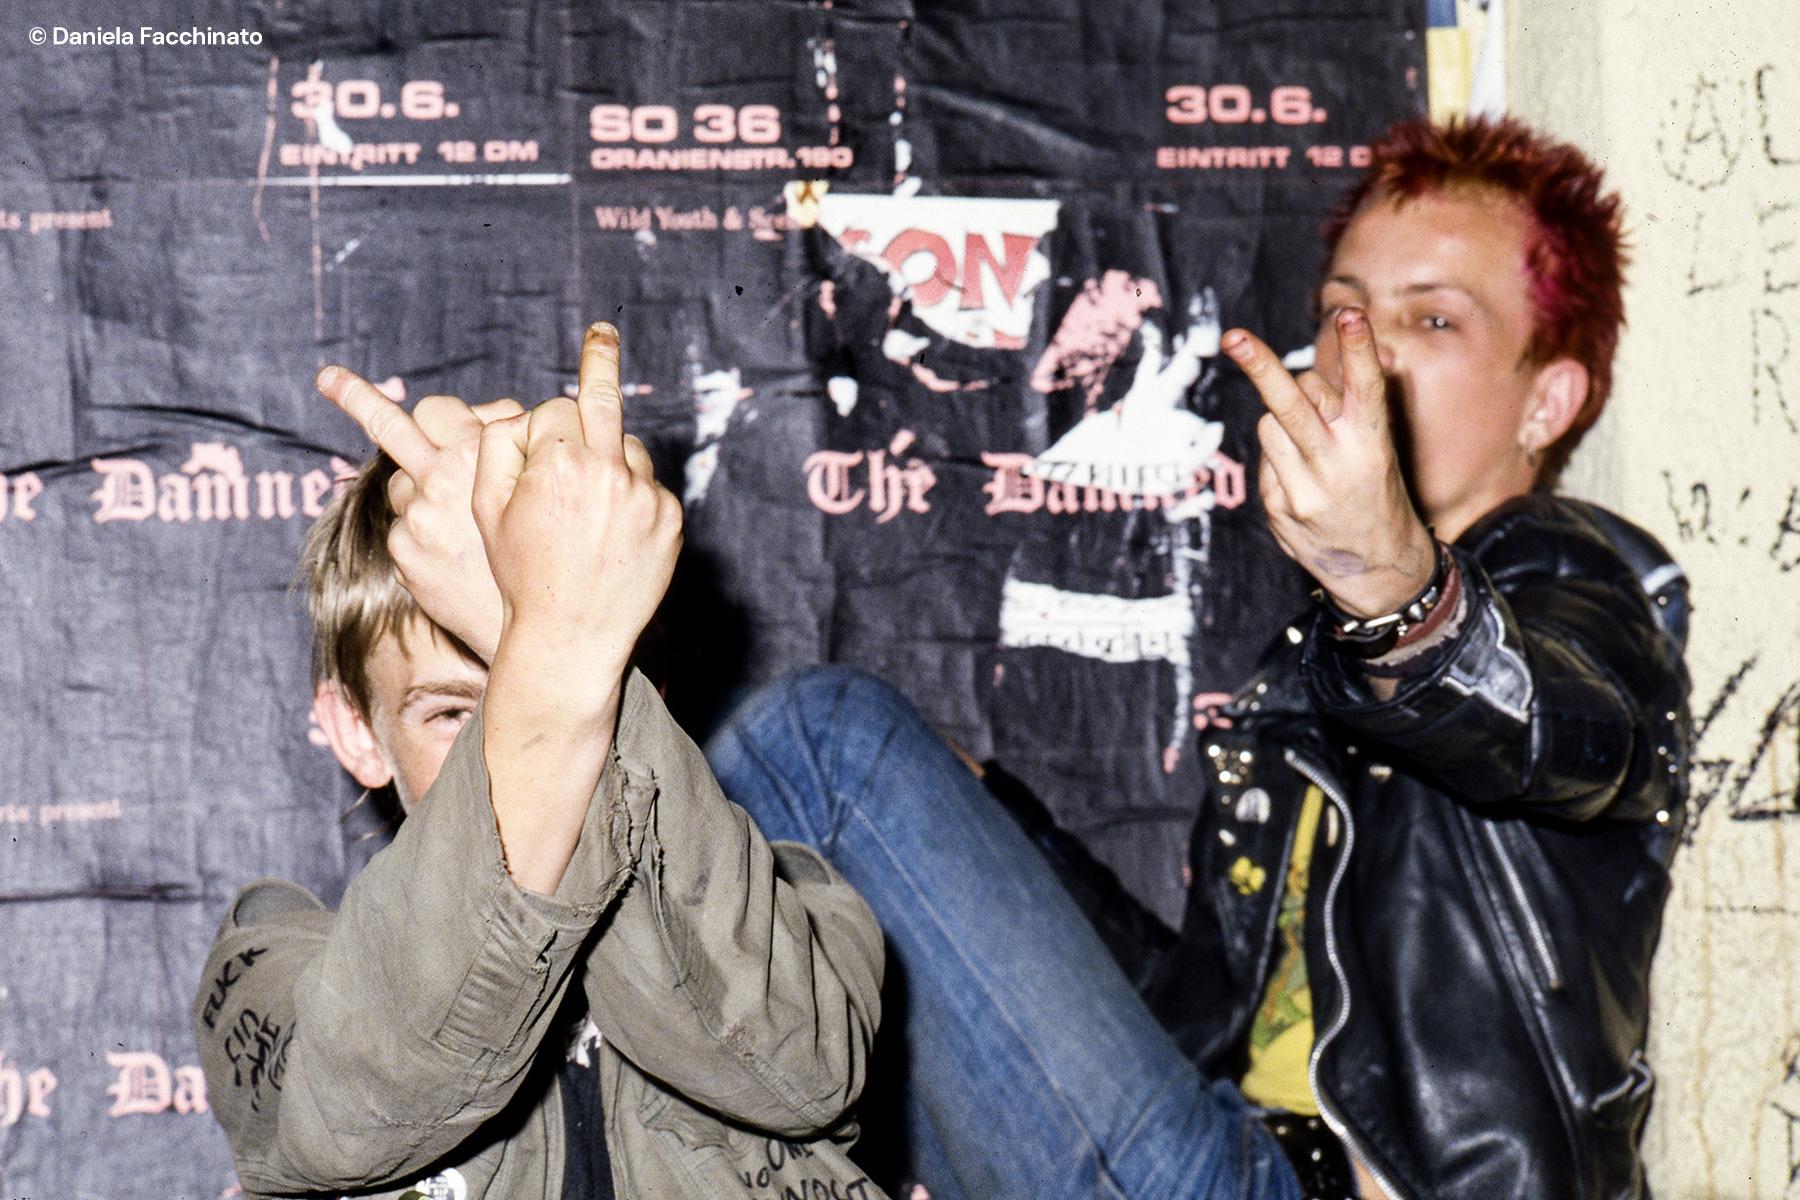 Punk at club S.O. 36 in Oranienstraße Berlin, 1981